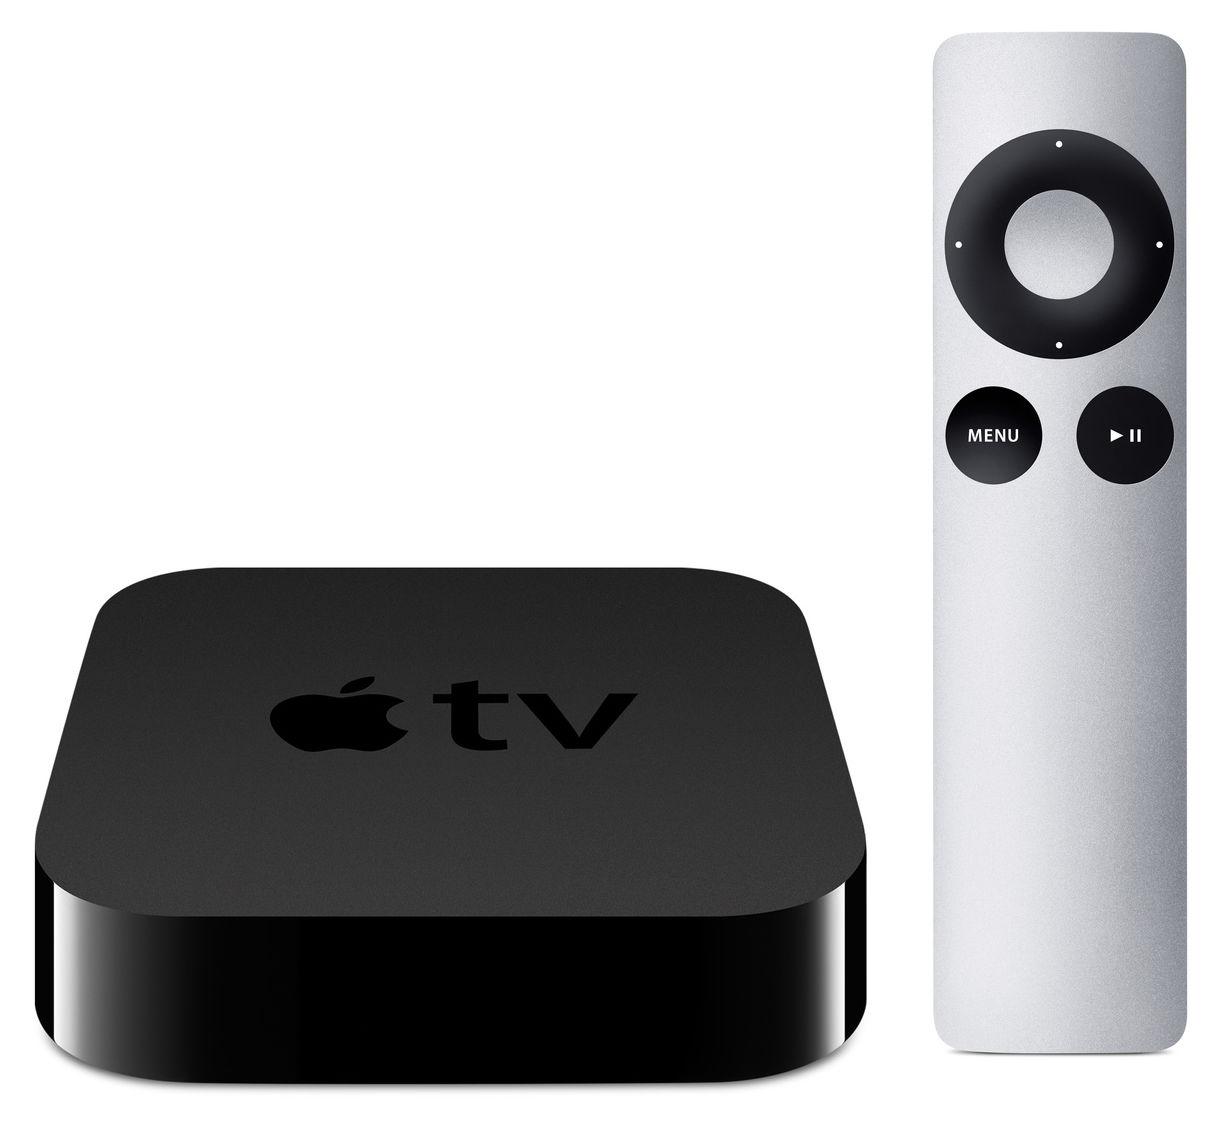 Appletv3gen youtubeappdiscon